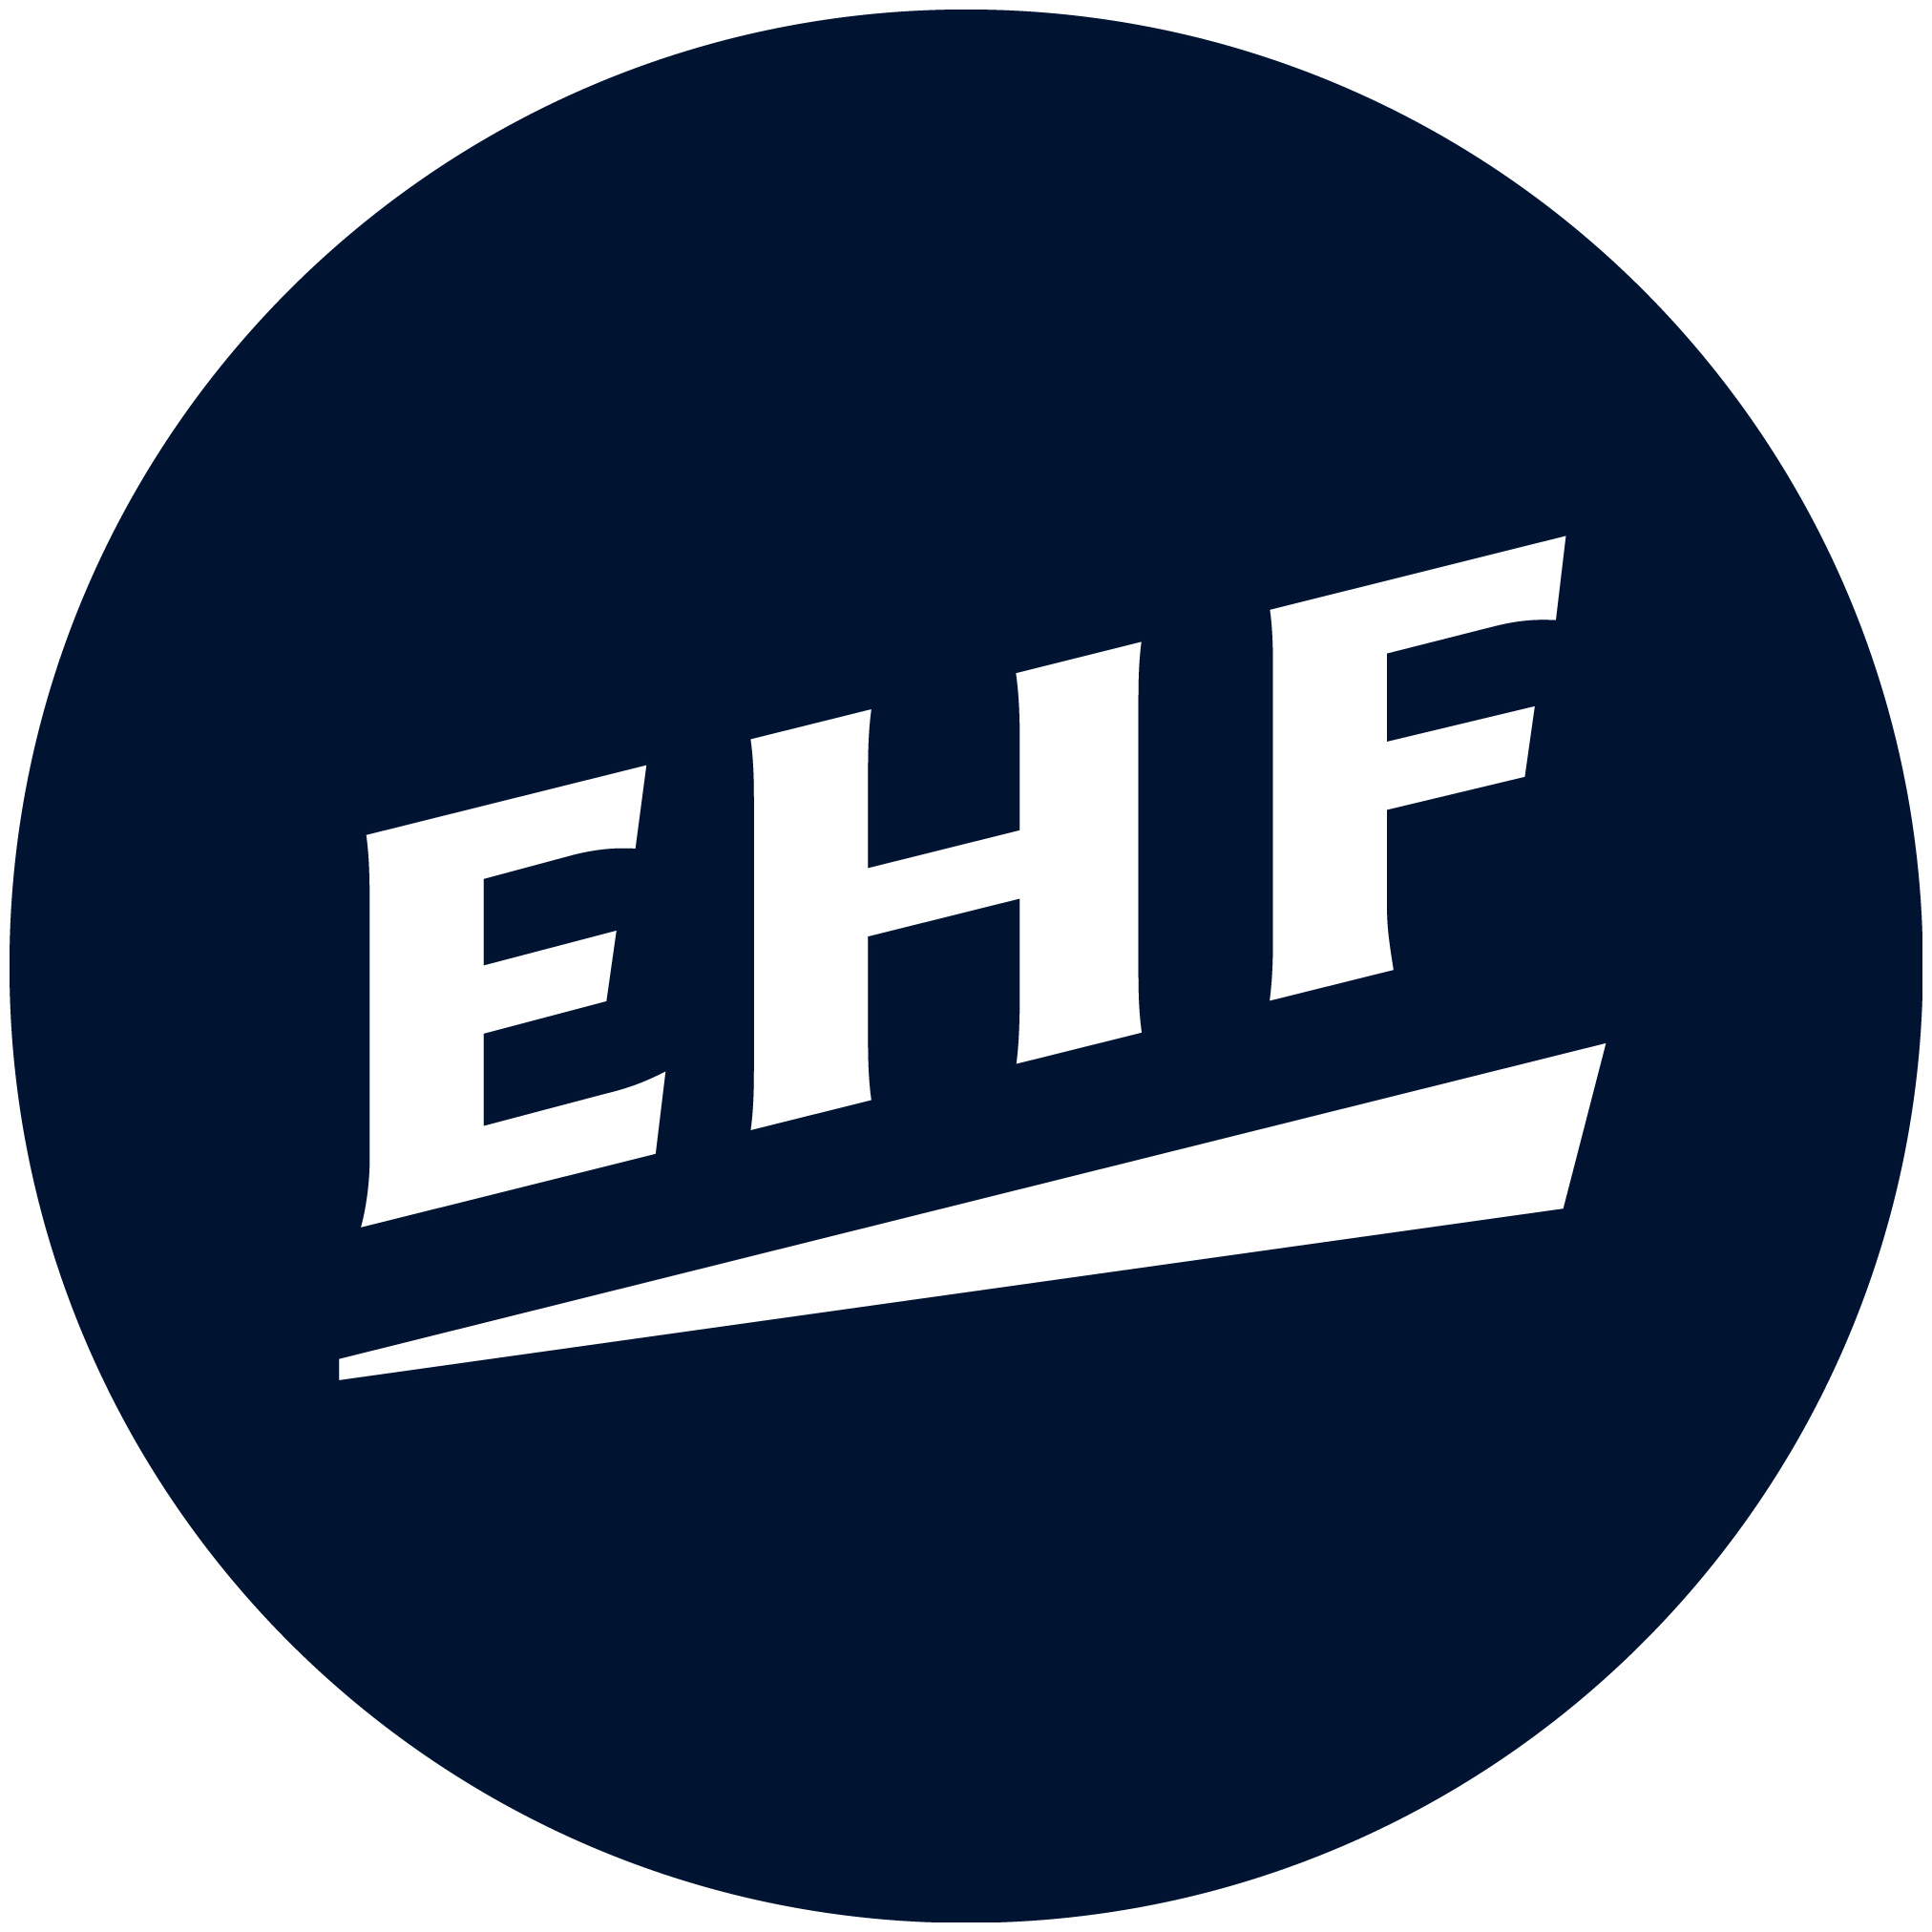 2019 European Handball Women's 17 EHF Championship - ITA